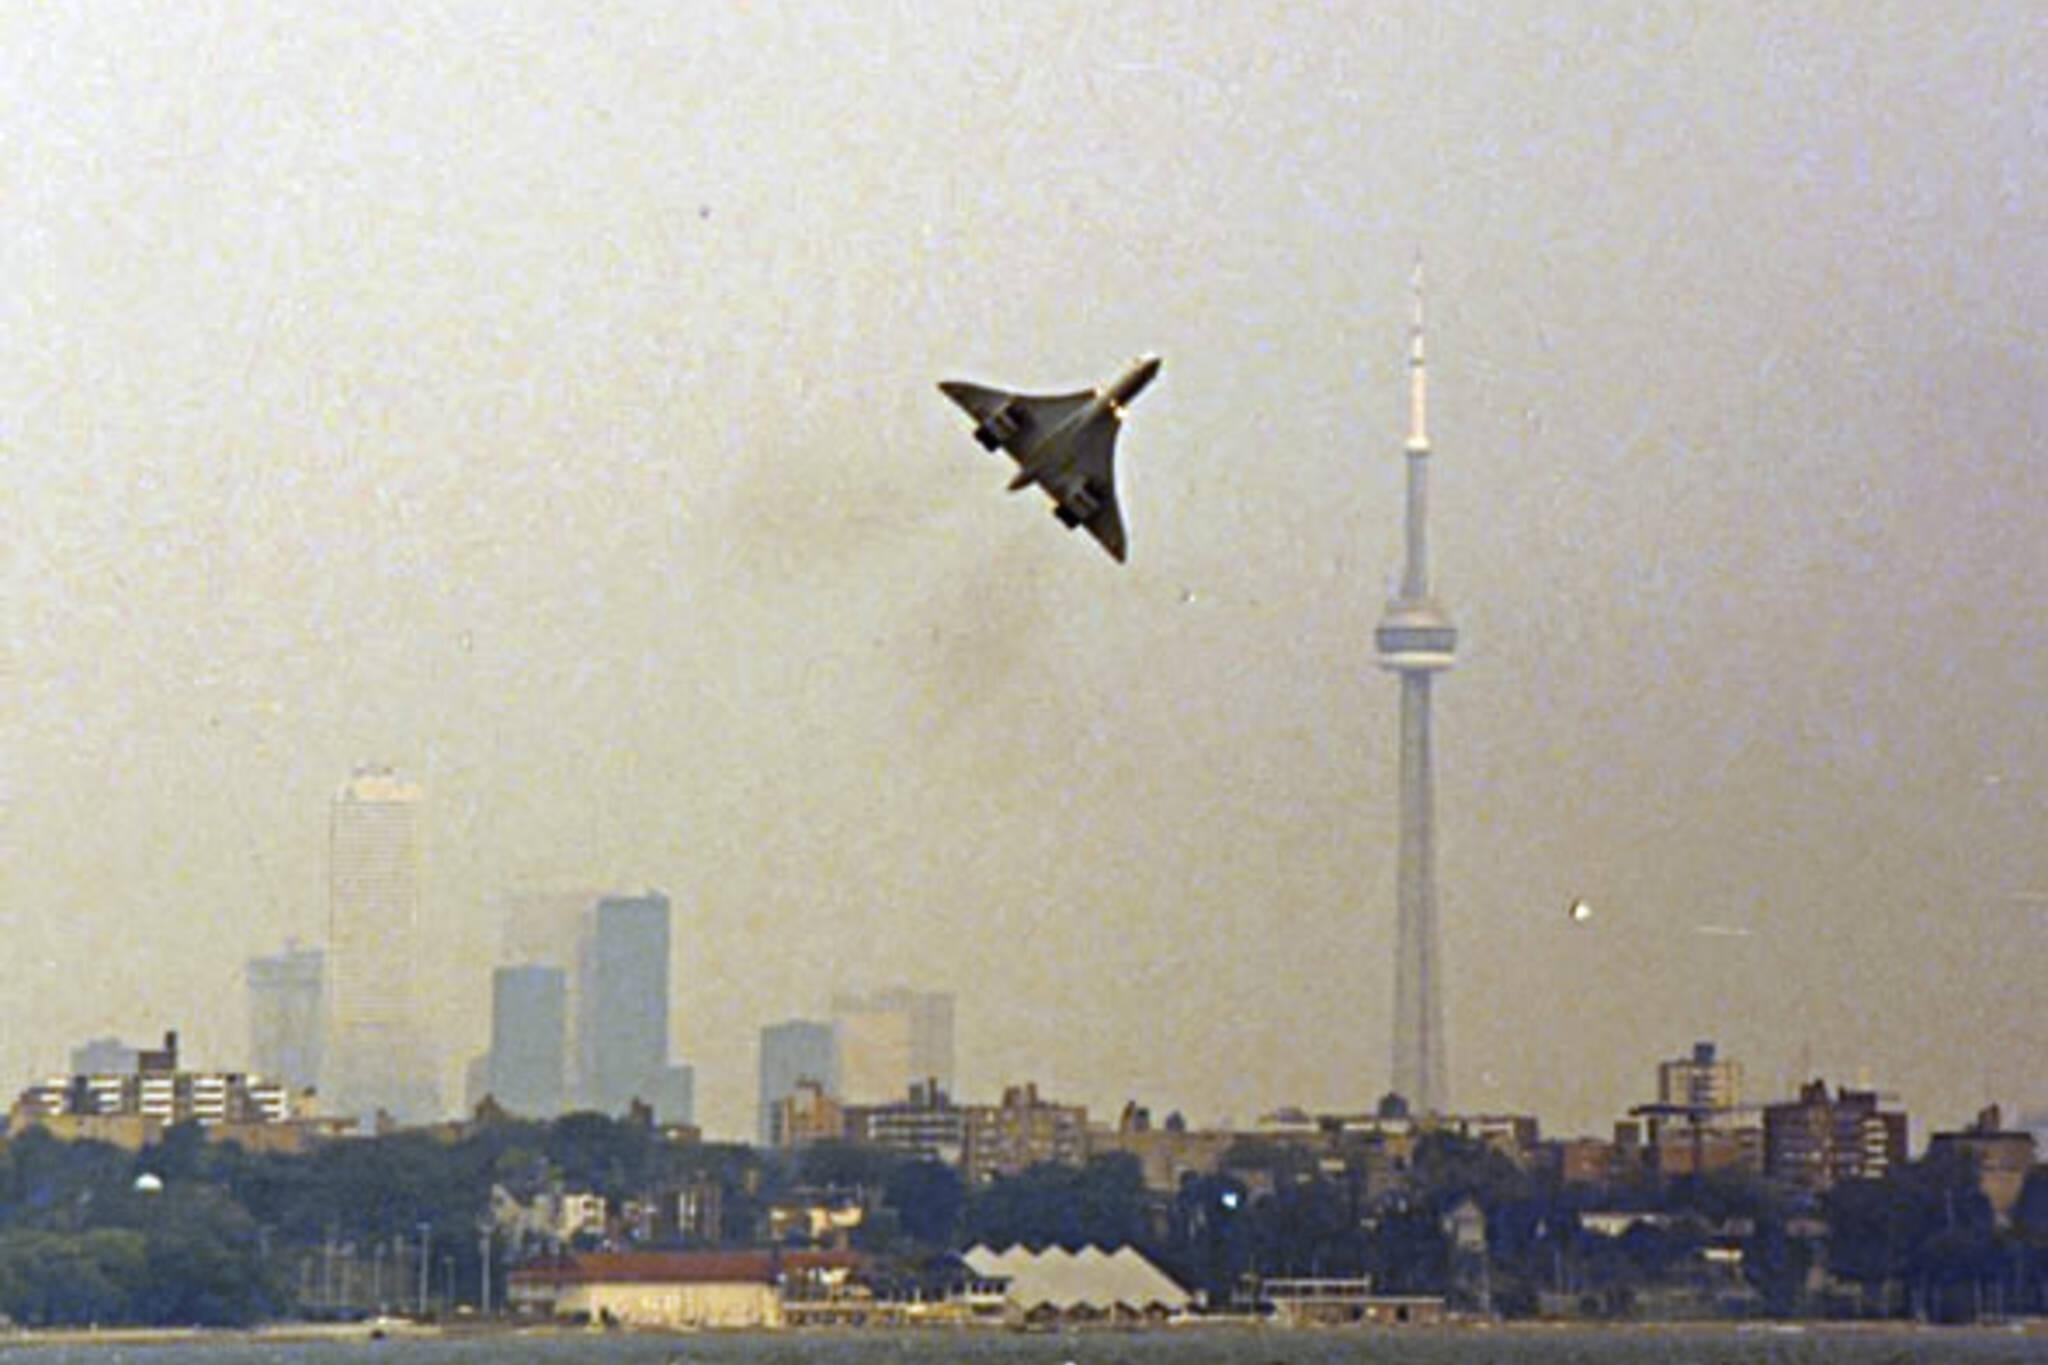 Concorde Toronto plane